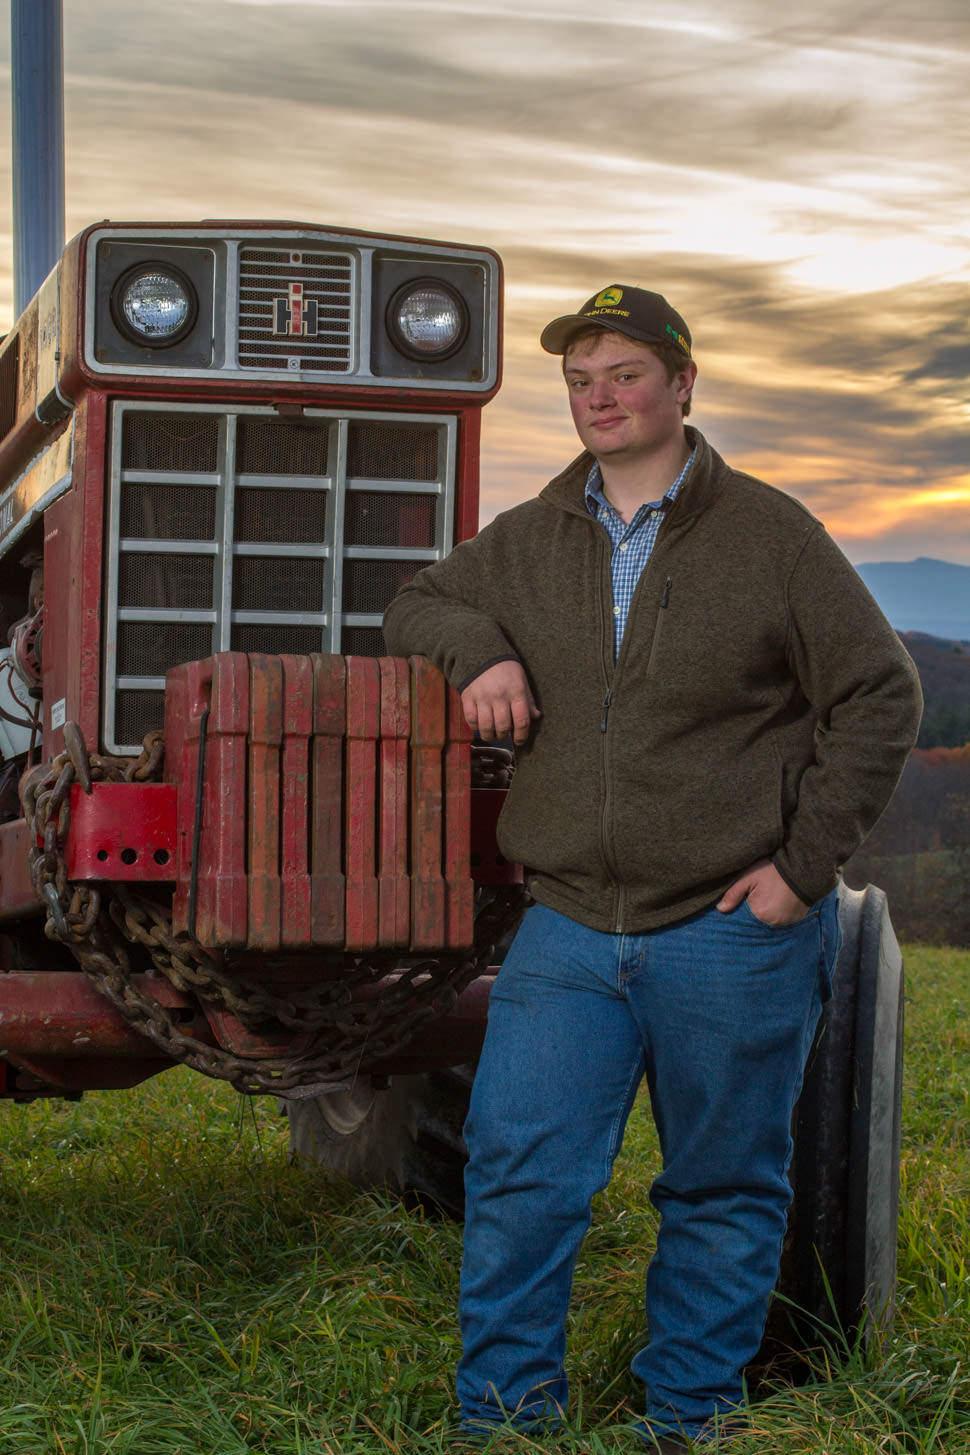 Senior Portrait with Tractor